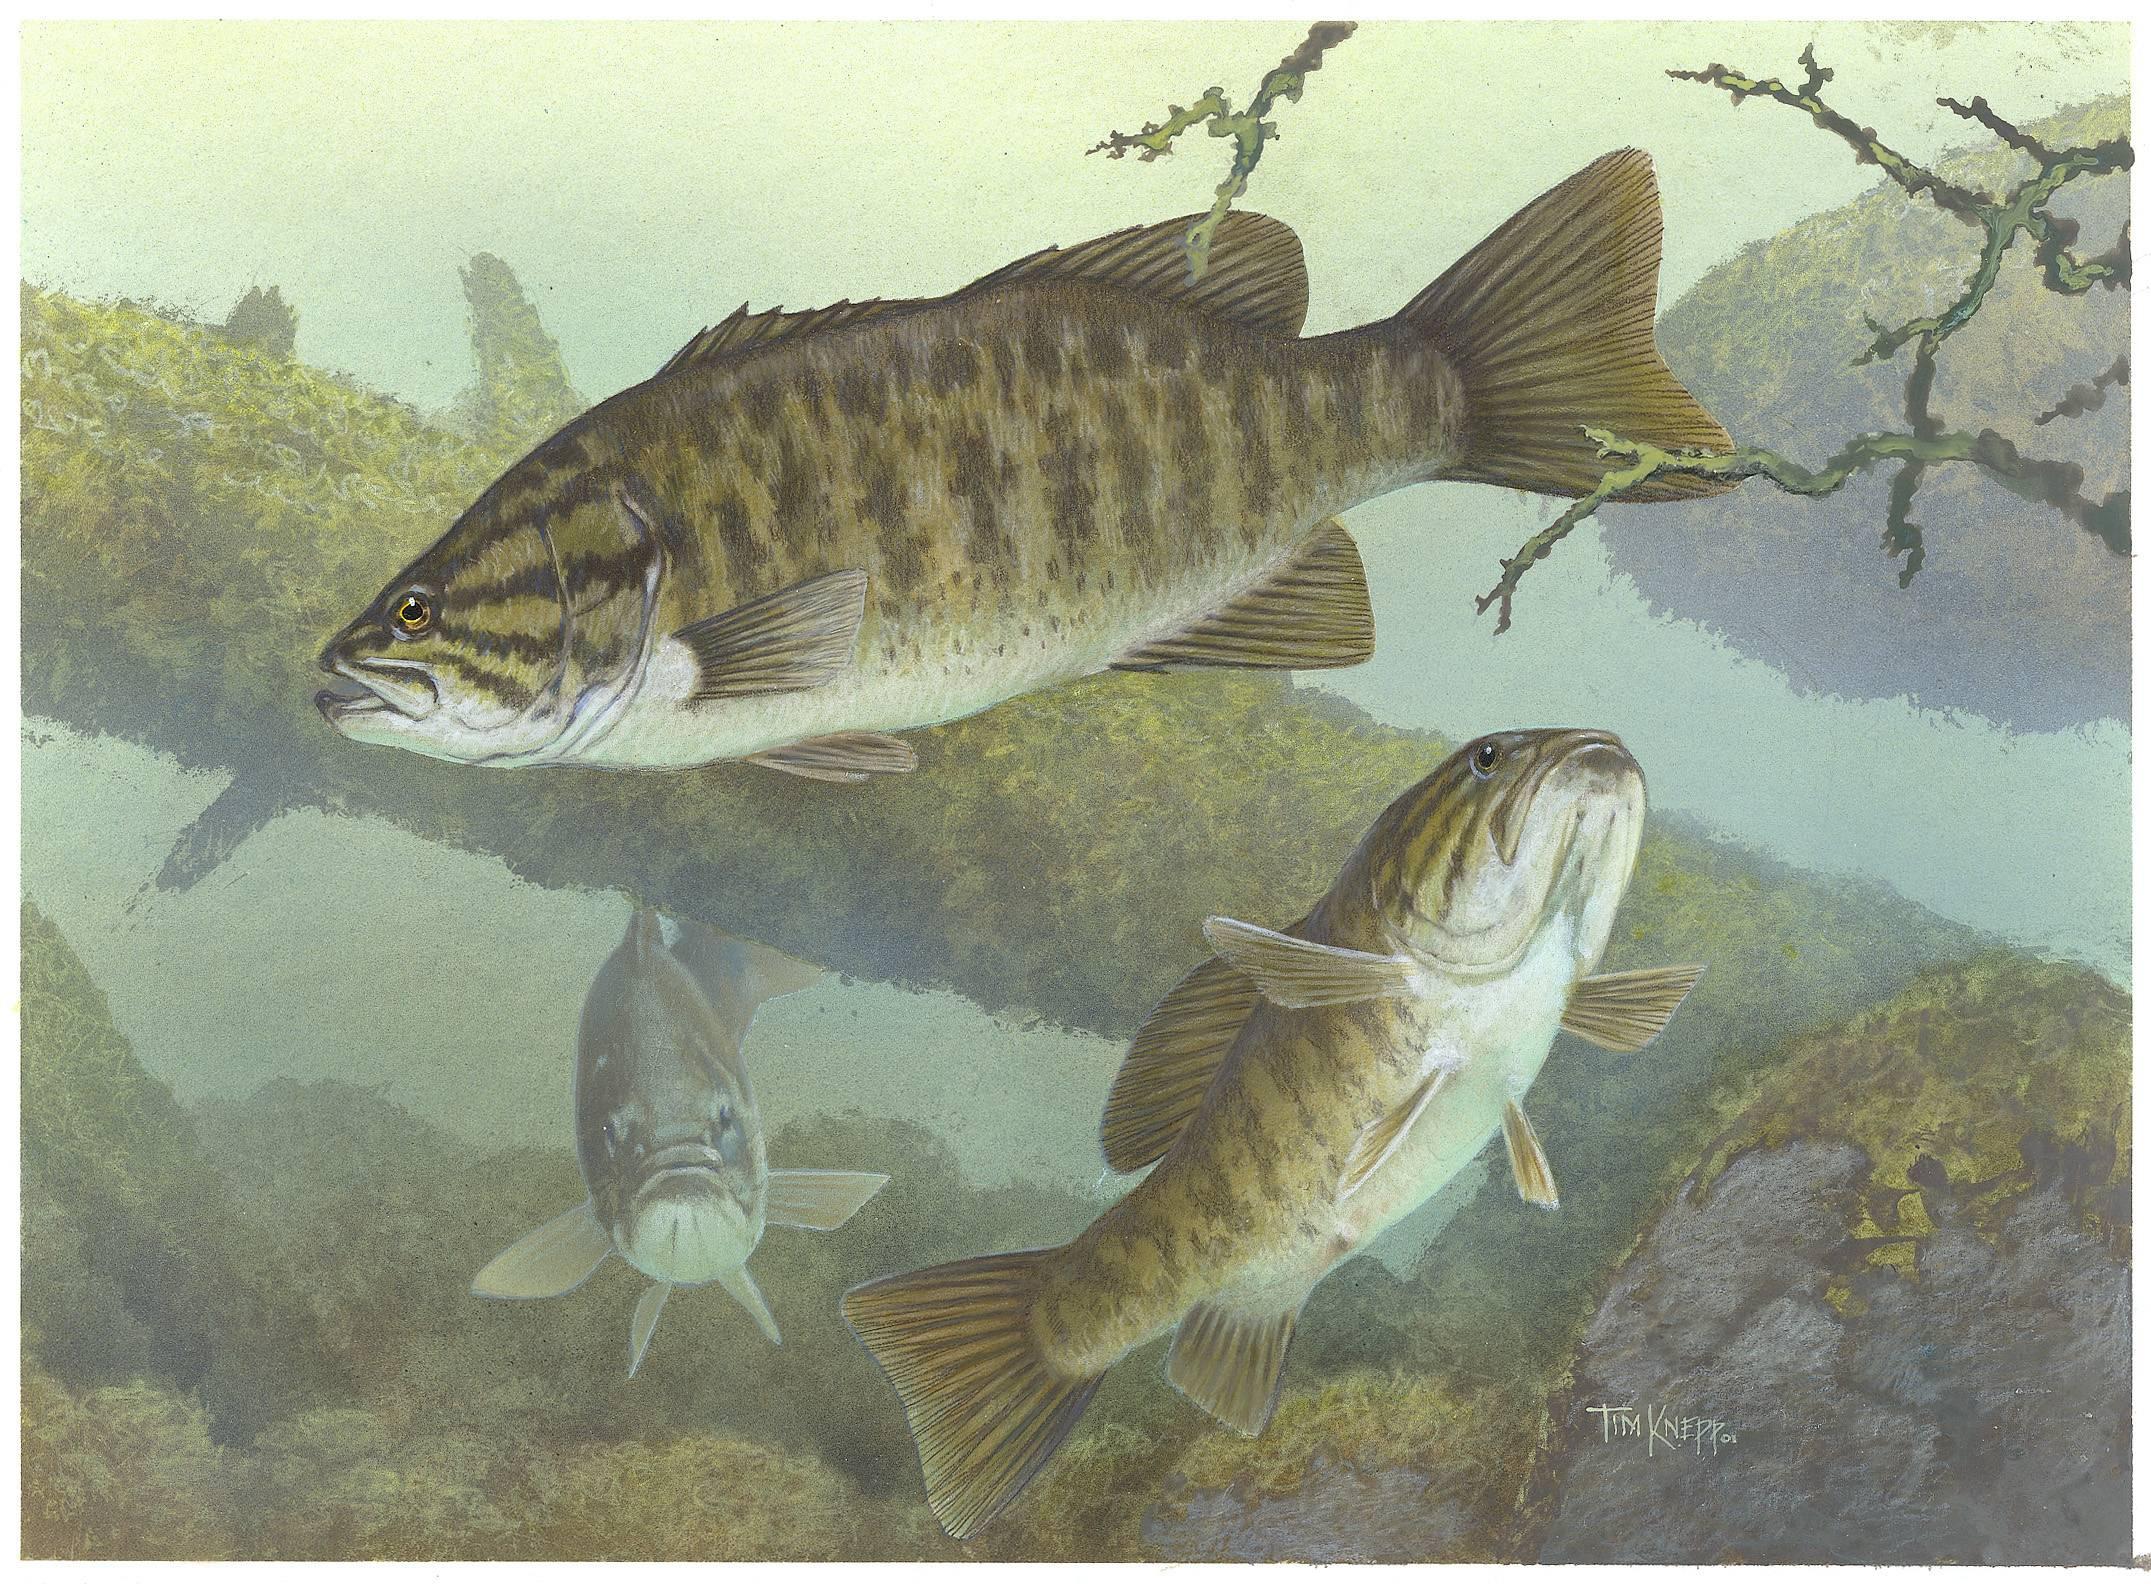 Bass Fishing Wallpaper Backgrounds 2151x1584